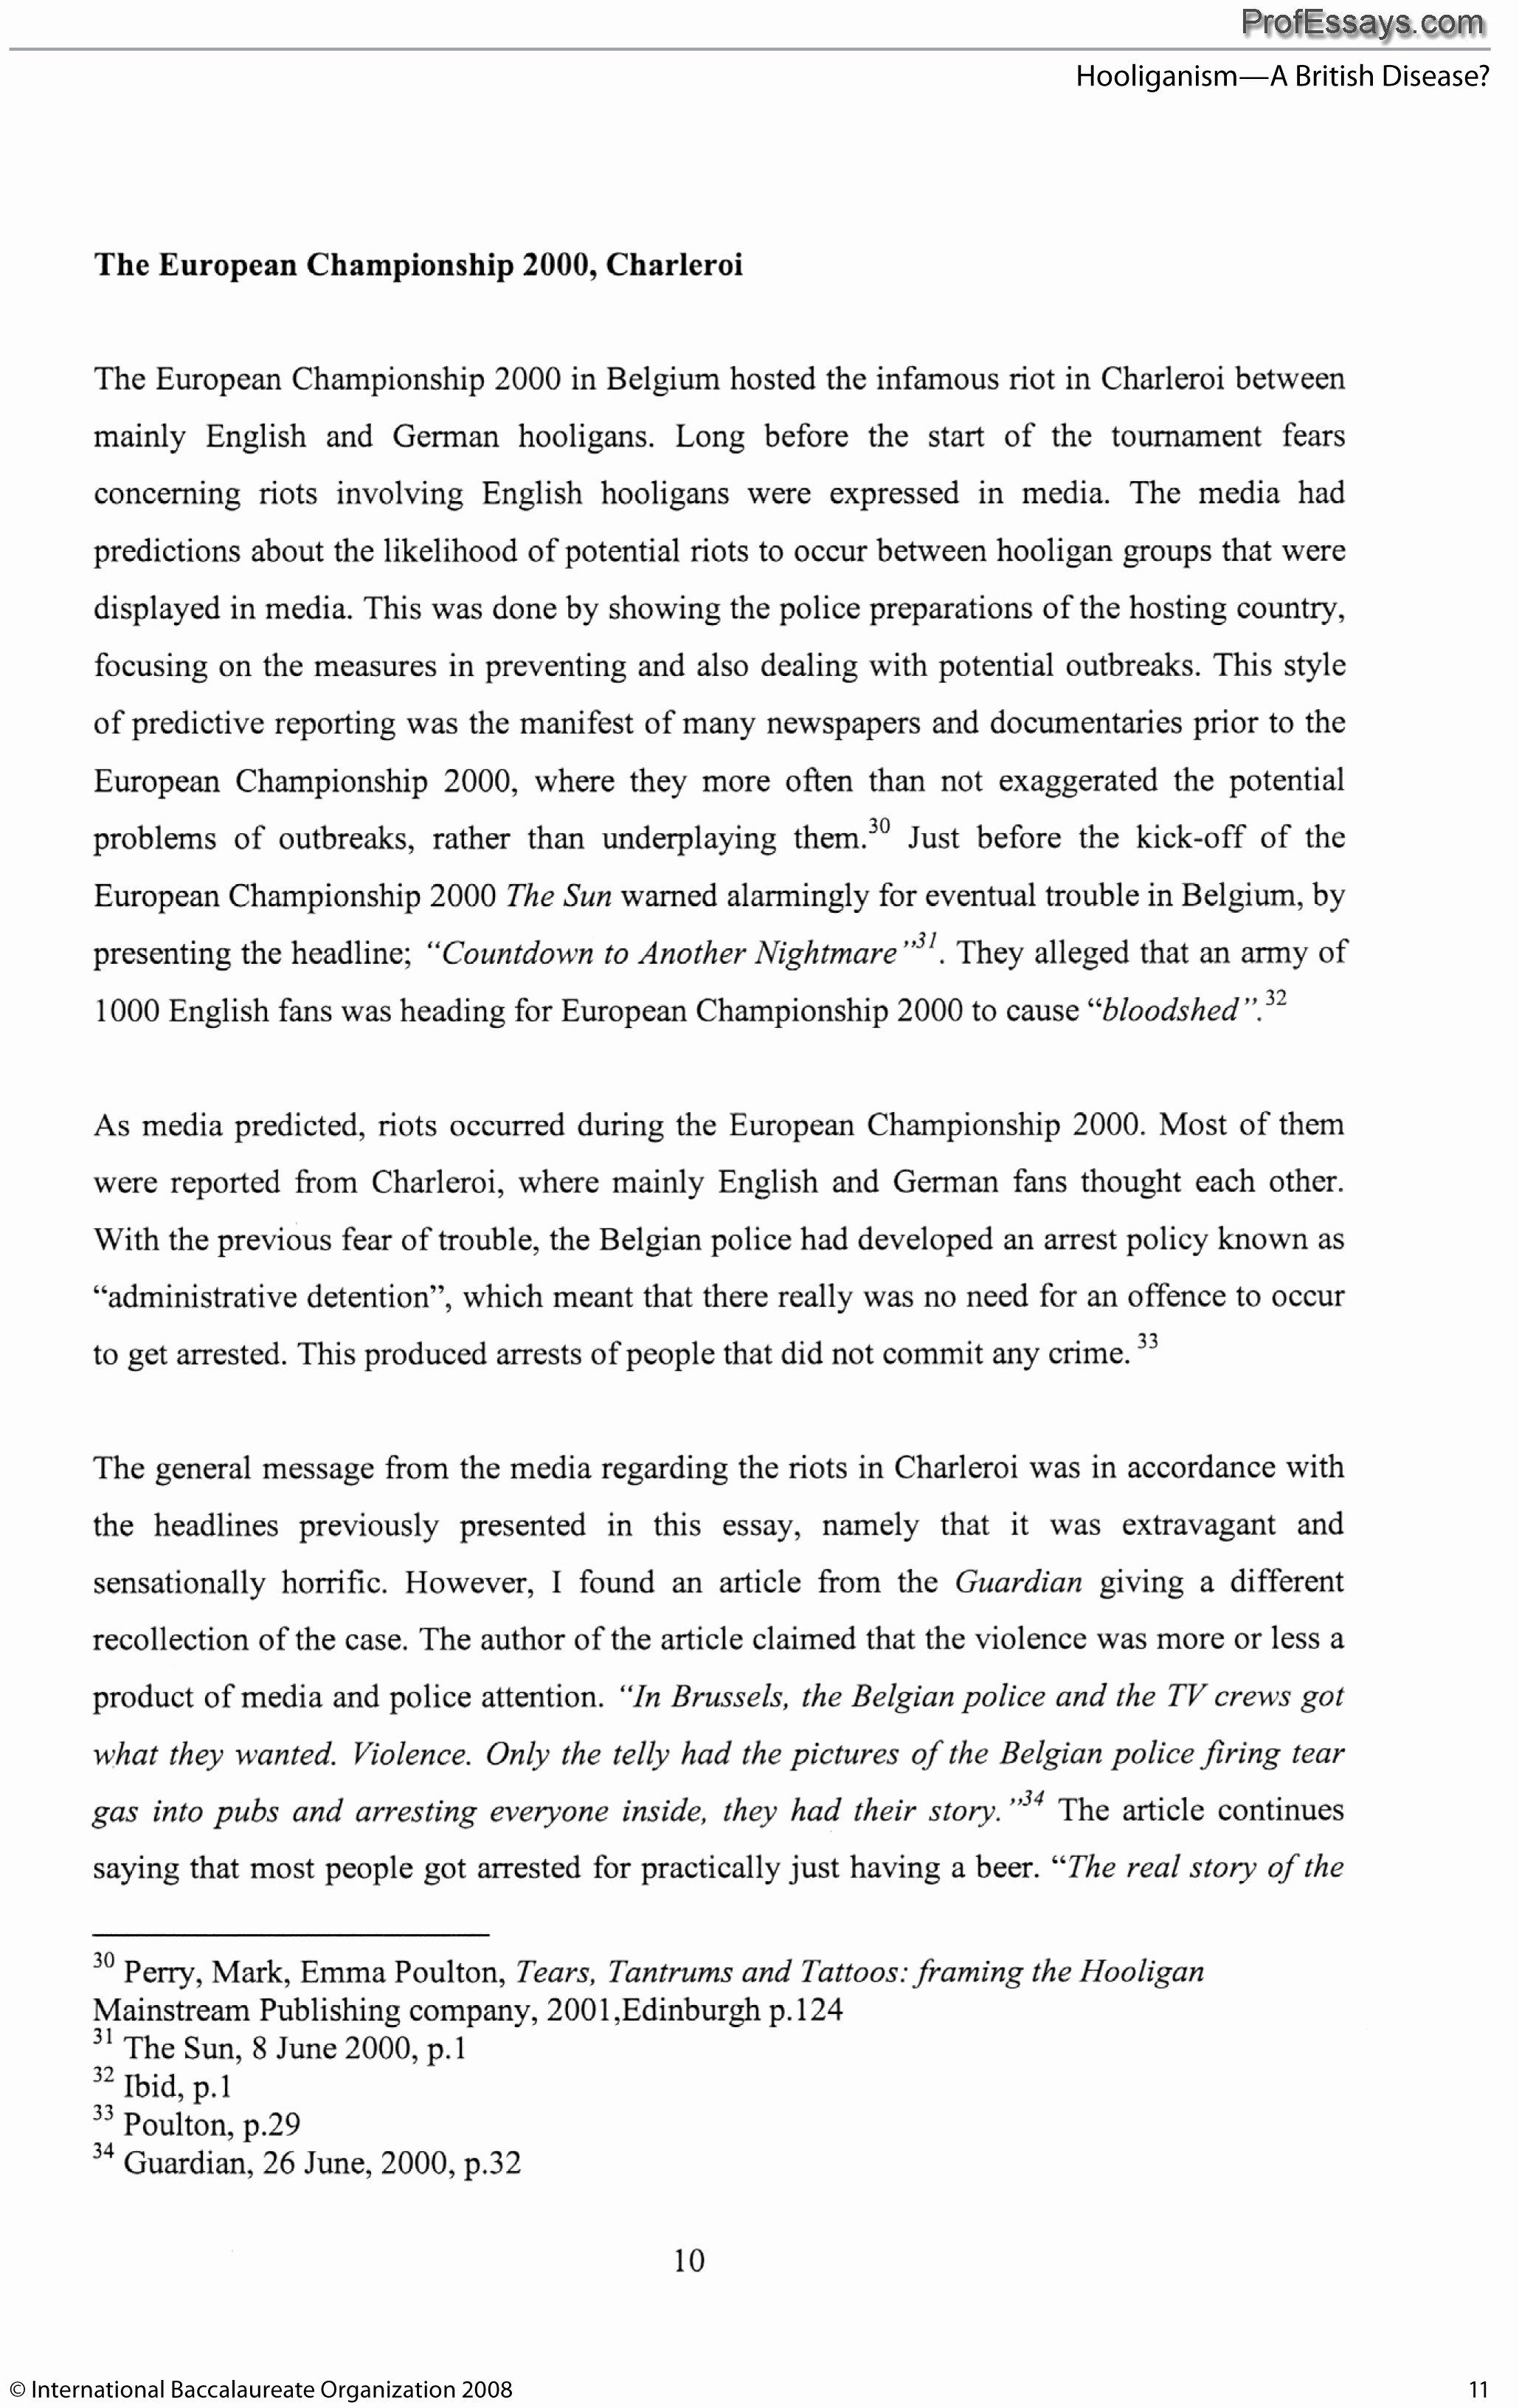 Art Institute Essay Example Unique Ib Extended Essay Help Essay Examples topics Writing